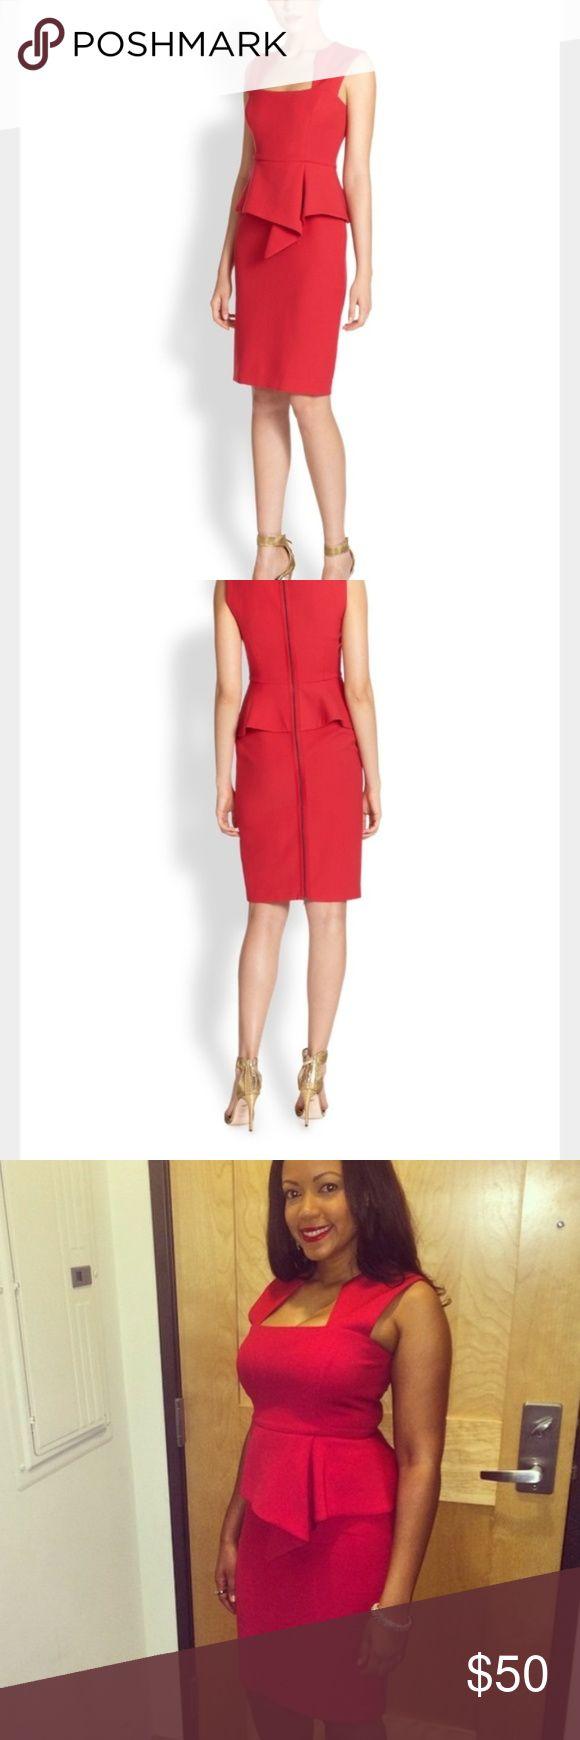 BCBGMaxAzria red peplum dress Perfect for a gala, wedding, or party. Excellent condition.  Red peplum dress.  Square neck. Sleeveless. Princess seams. Wrap peplum at waist with draped detail. Pencil skirt. Exposed back dual-way zipper closure. BCBGMaxAzria Dresses Mini